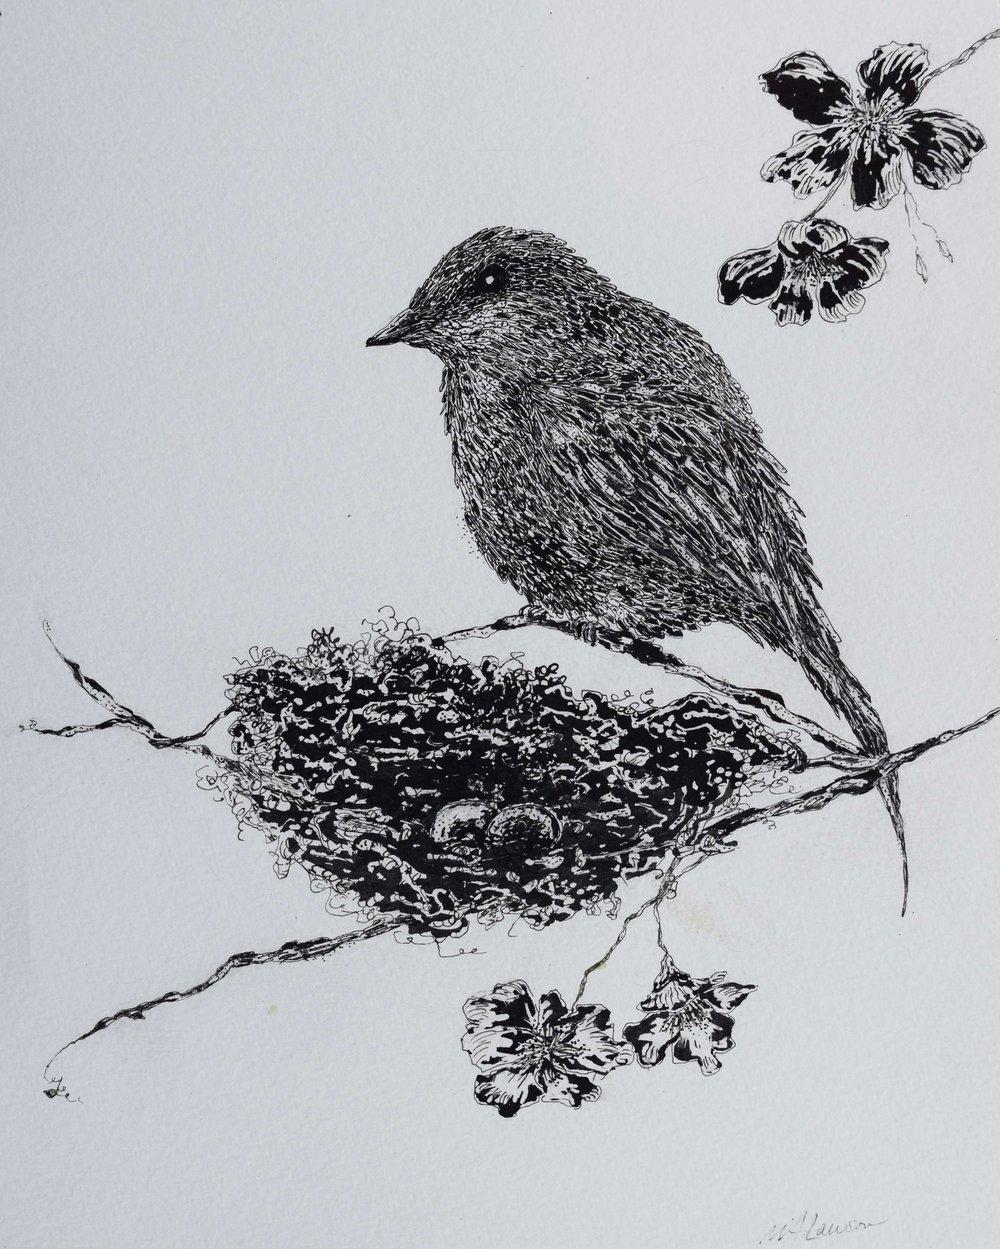 Bird-with-Nest.jpg